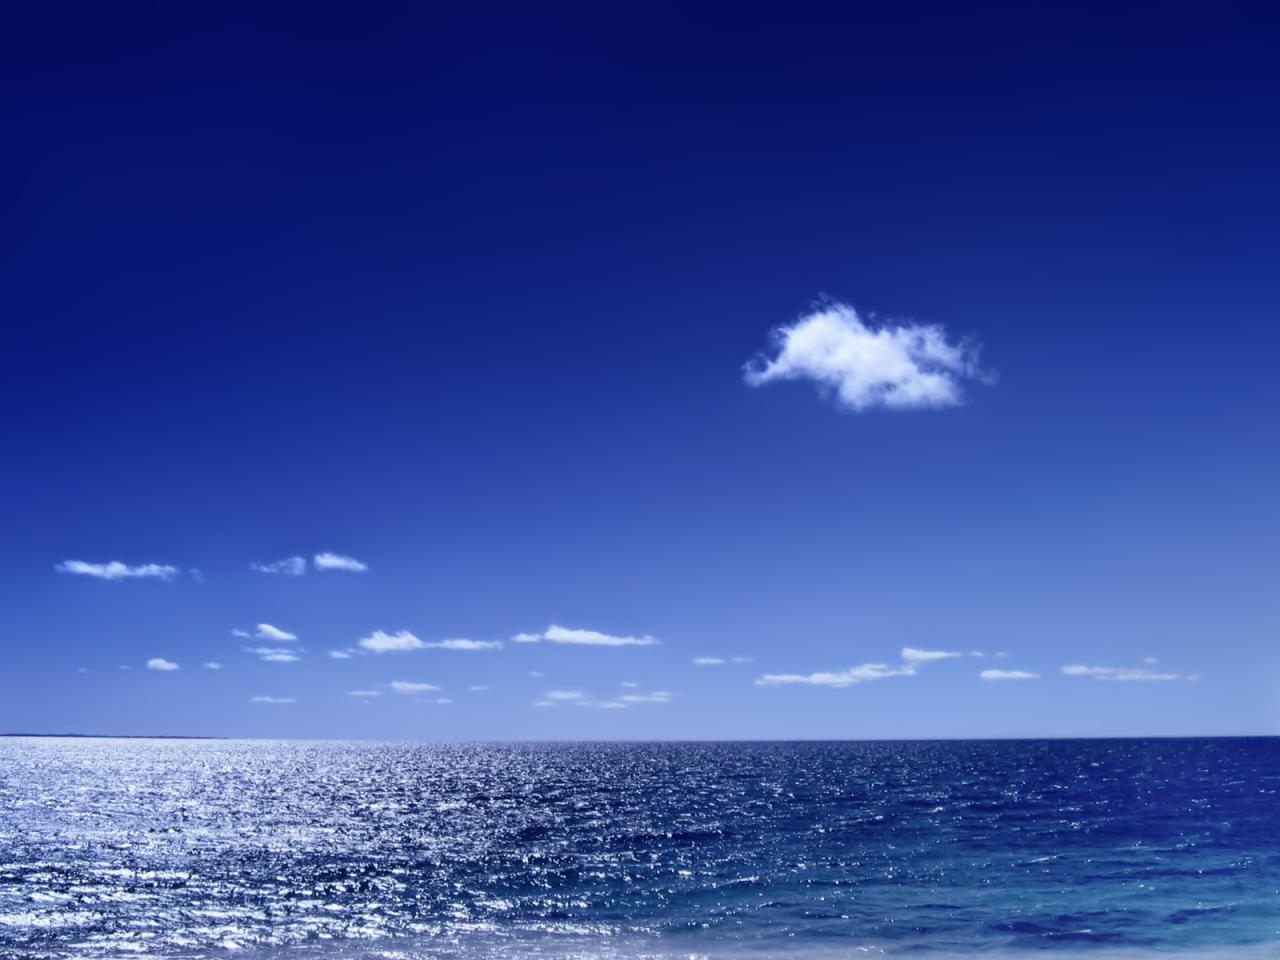 http://2.bp.blogspot.com/-l5TBaYYgY_4/TdP8p9G-zCI/AAAAAAAAFzc/_hQtxLh-fdU/s1600/cielo-azul-90679.jpeg